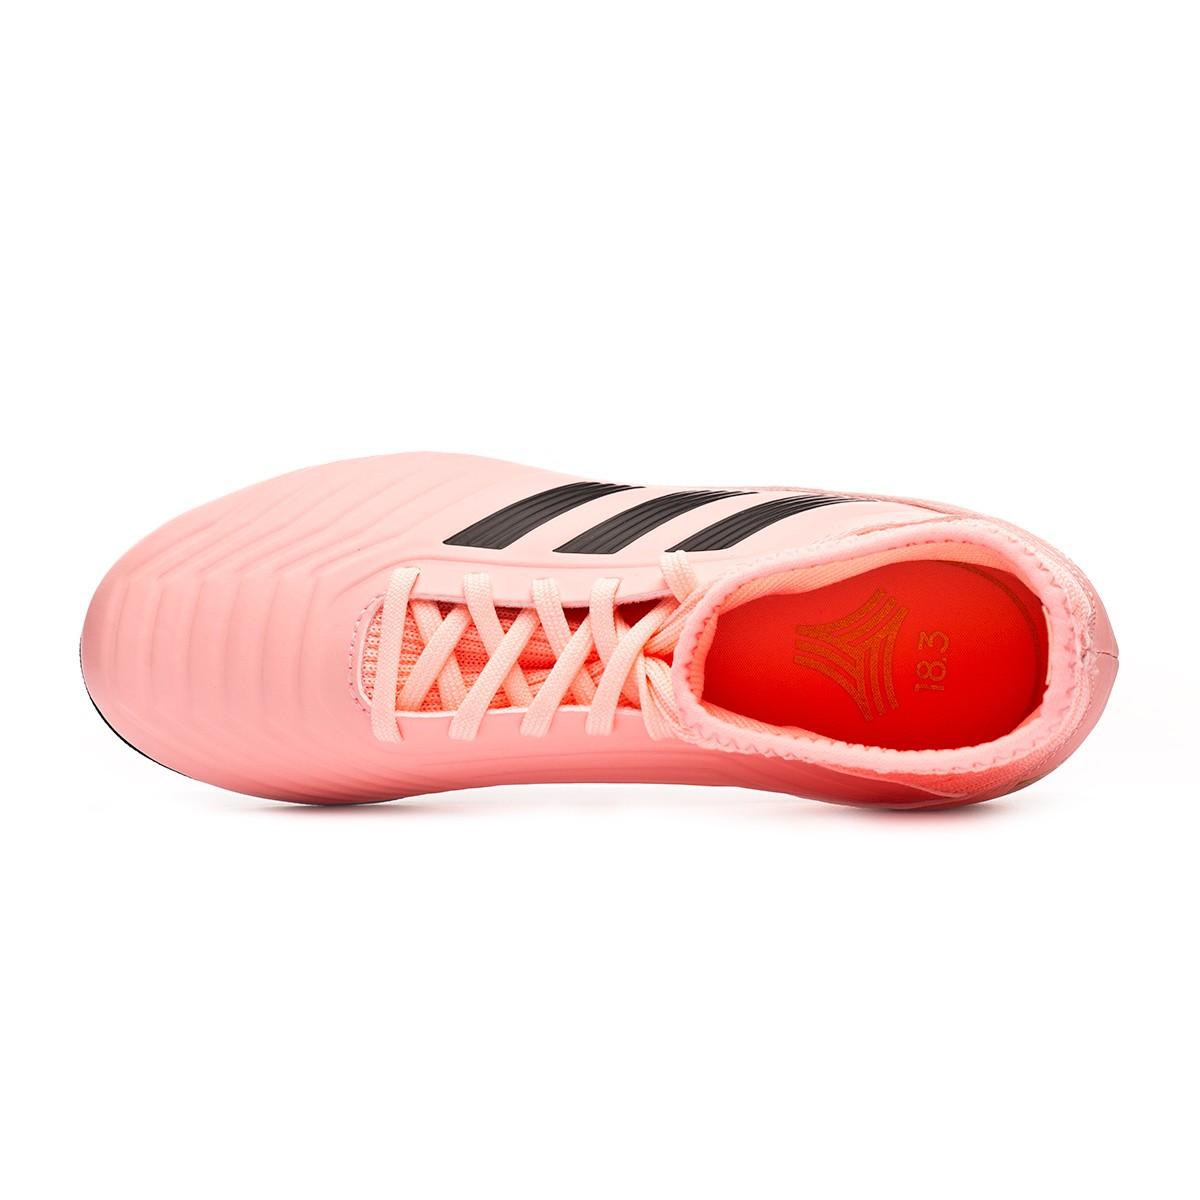 95b1119562c Football Boot adidas Kids Predator Tango 18.3 Turf Clear orange-Black-Trace  pink - Football store Fútbol Emotion